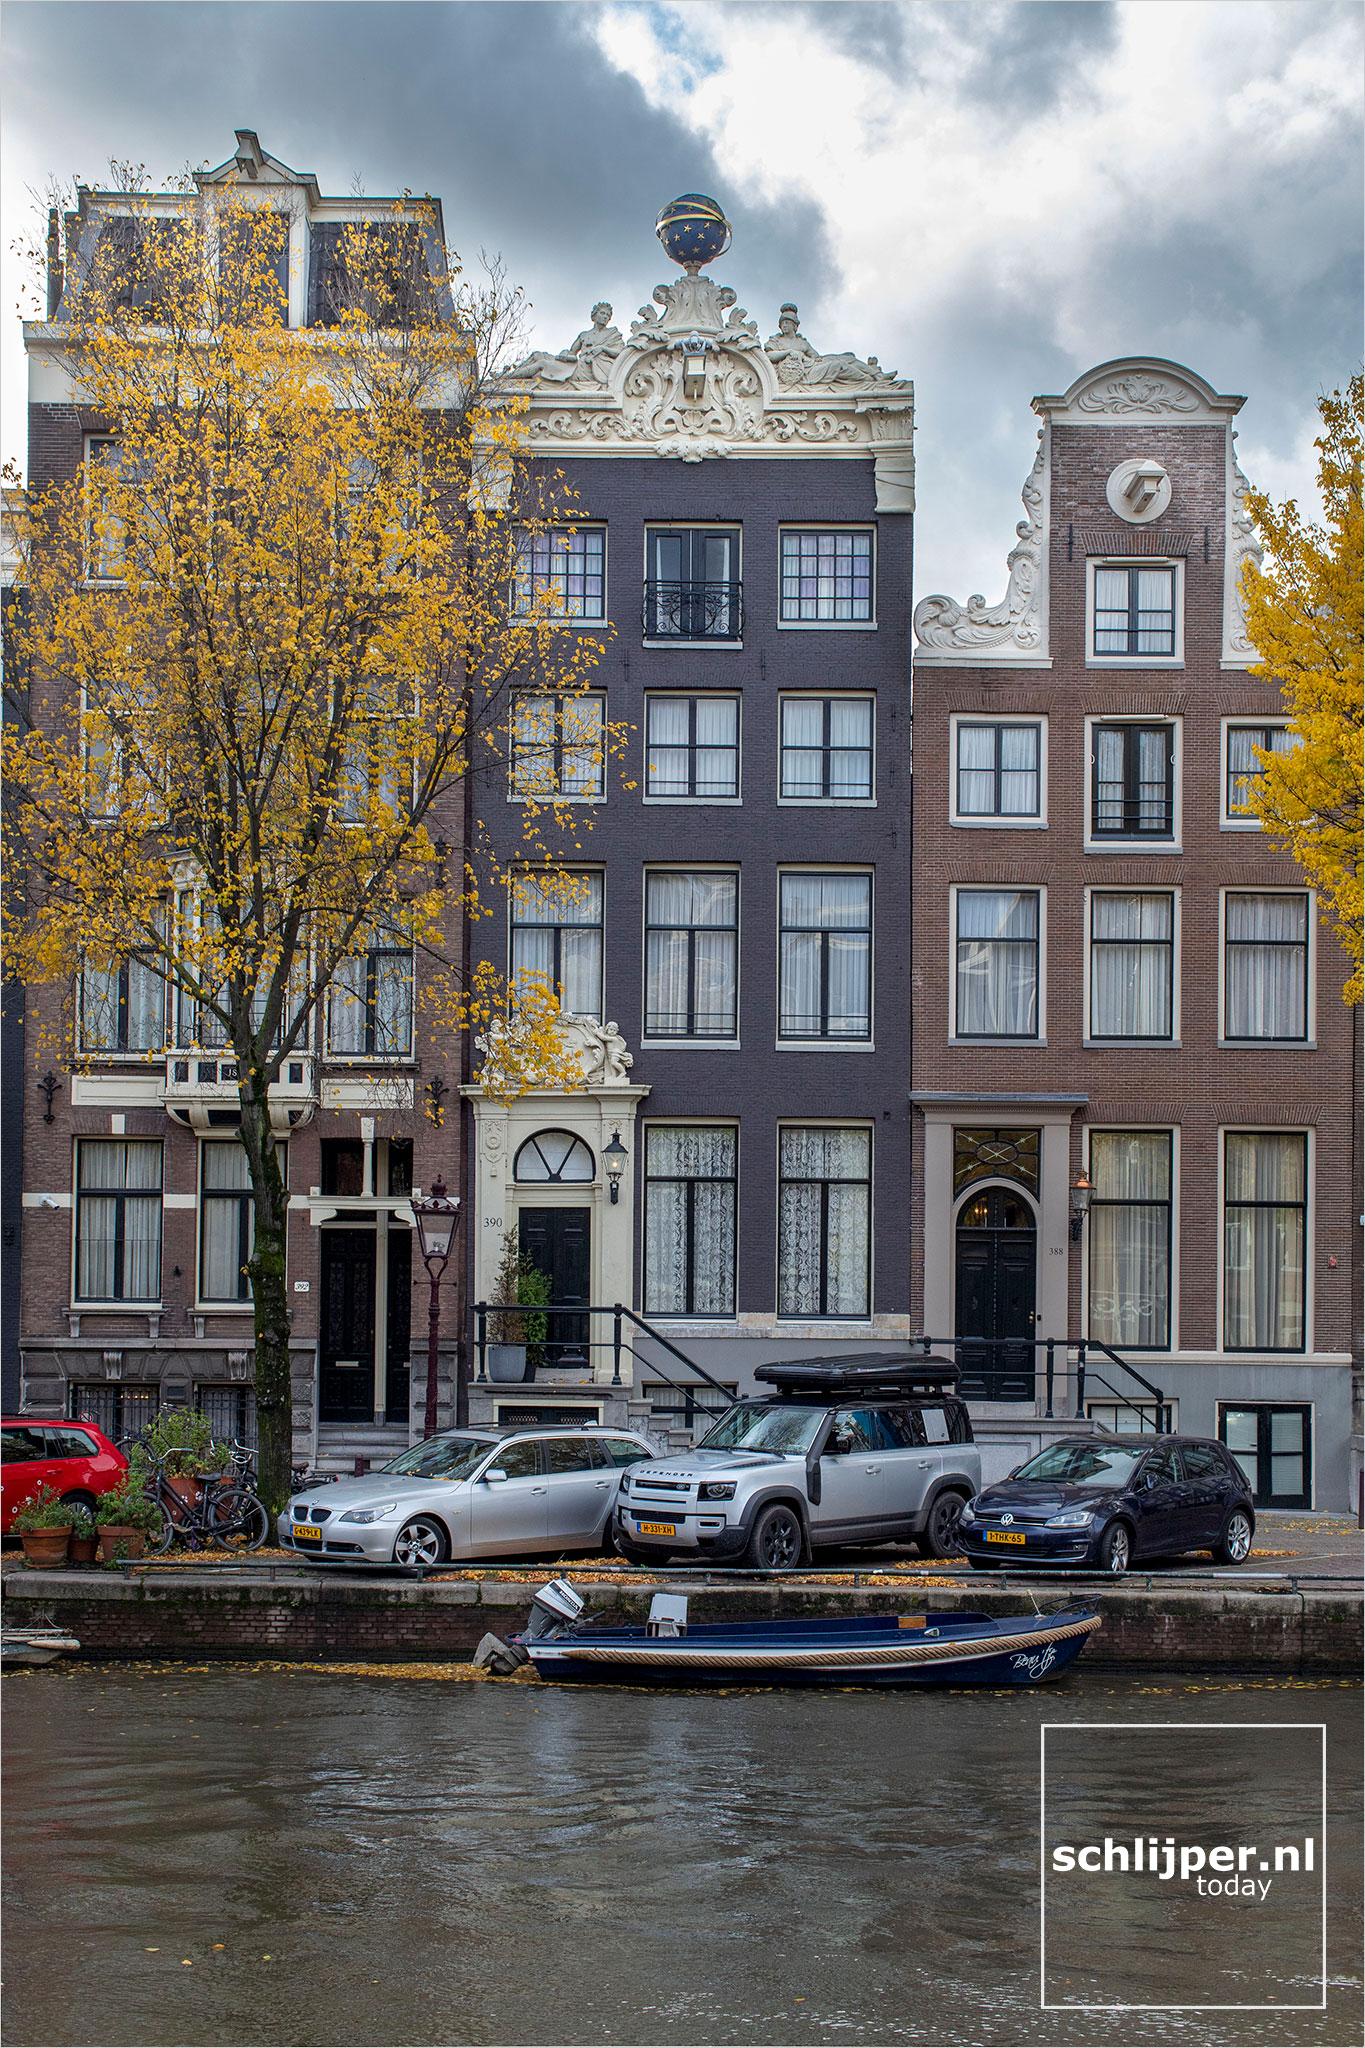 Nederland, Amsterdam, 21 oktober 2020